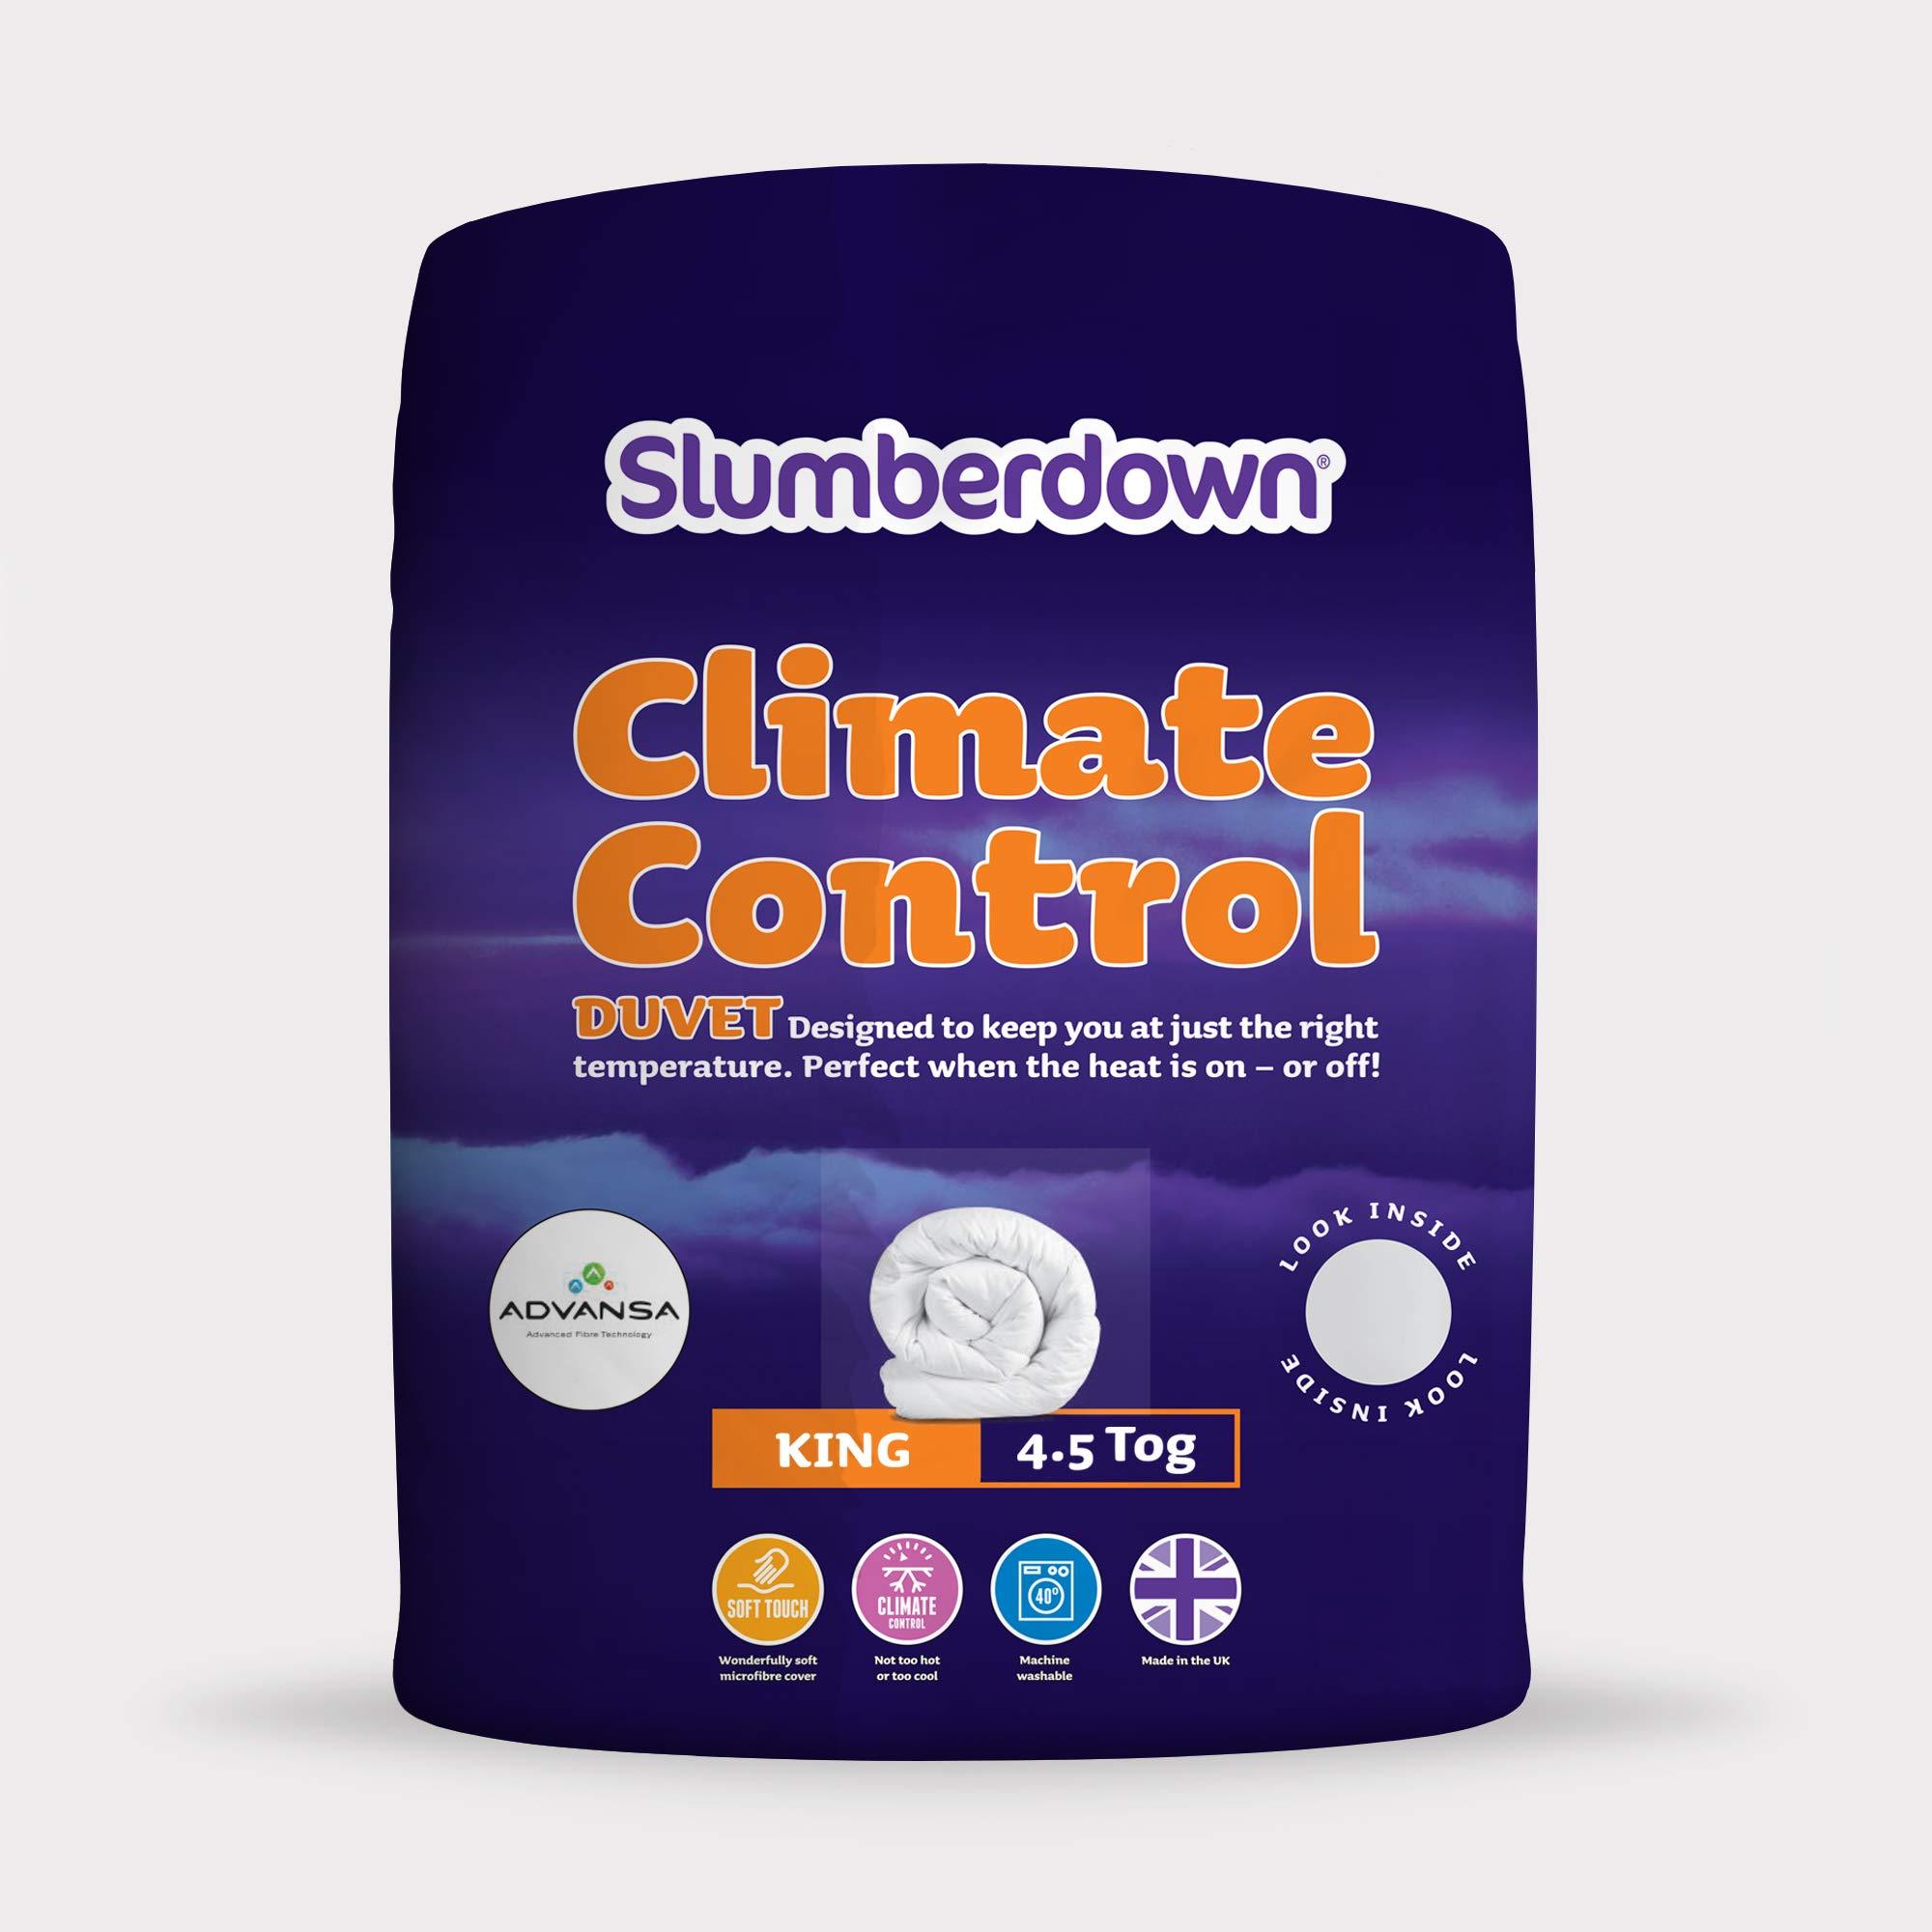 Slumberdown Climate Control King Size